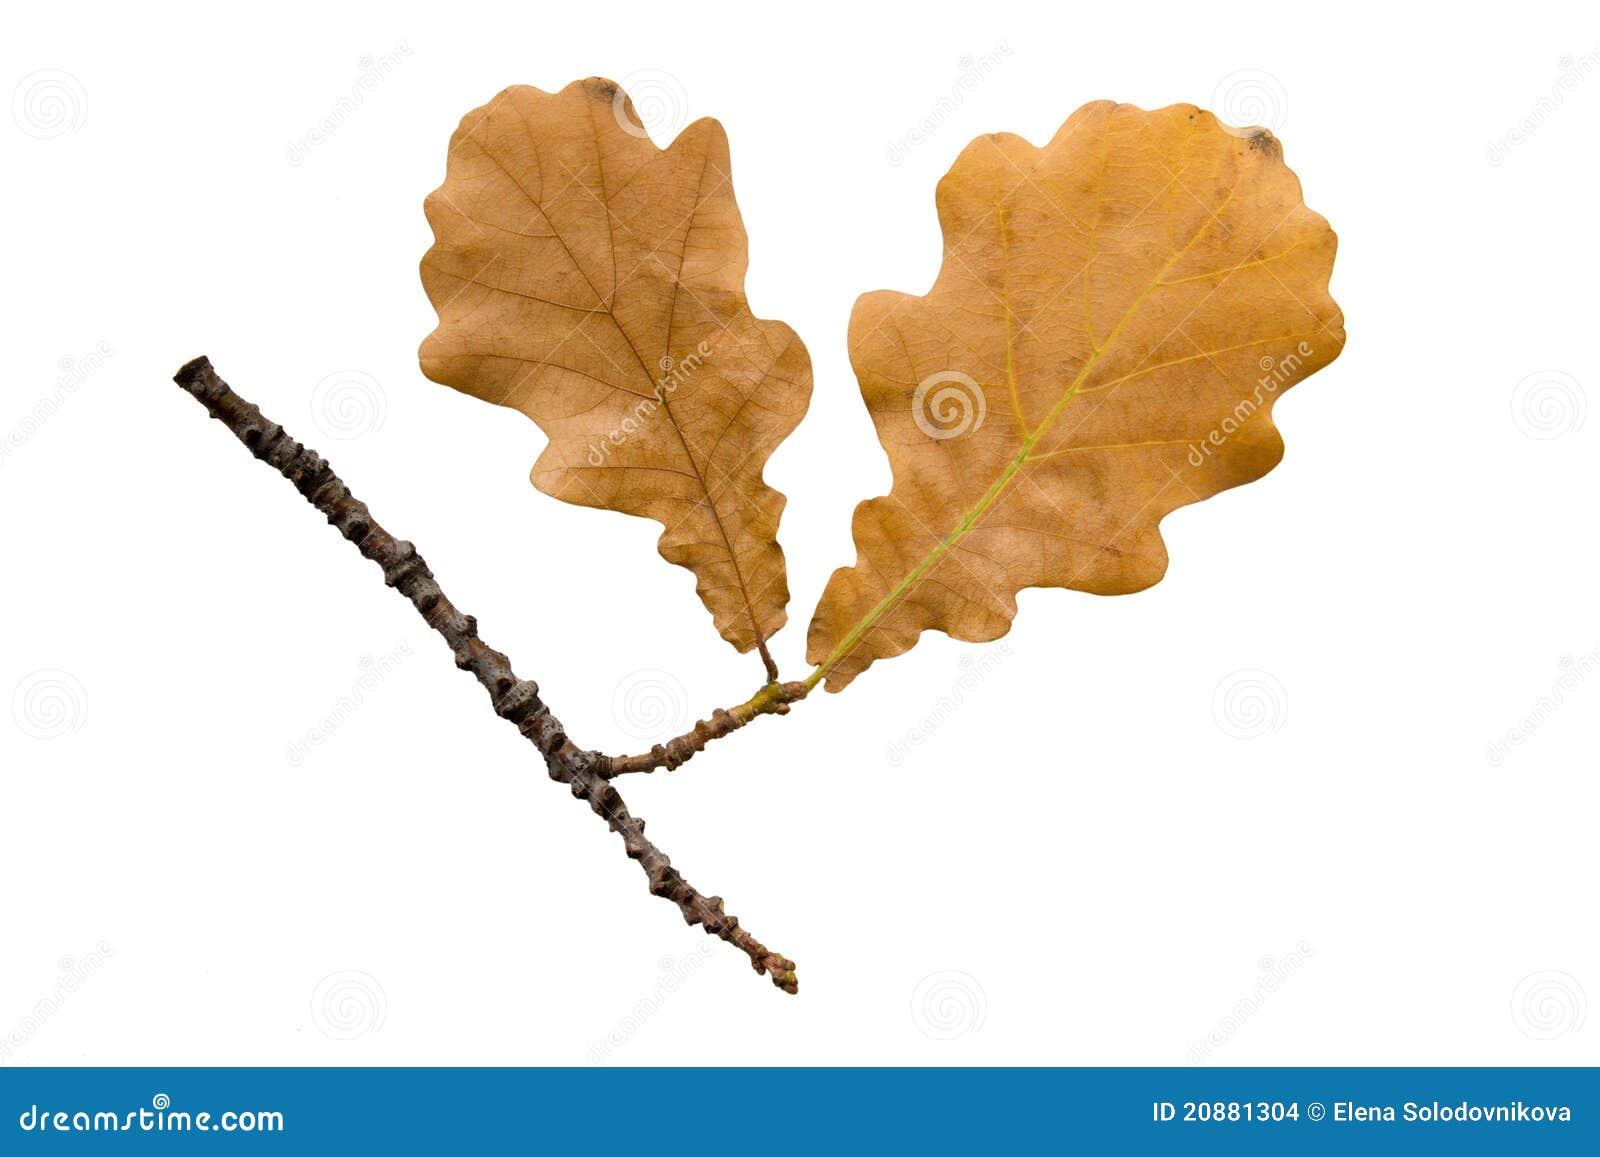 The Autumn Oak Twig On White Stock Images - Image: 20881304